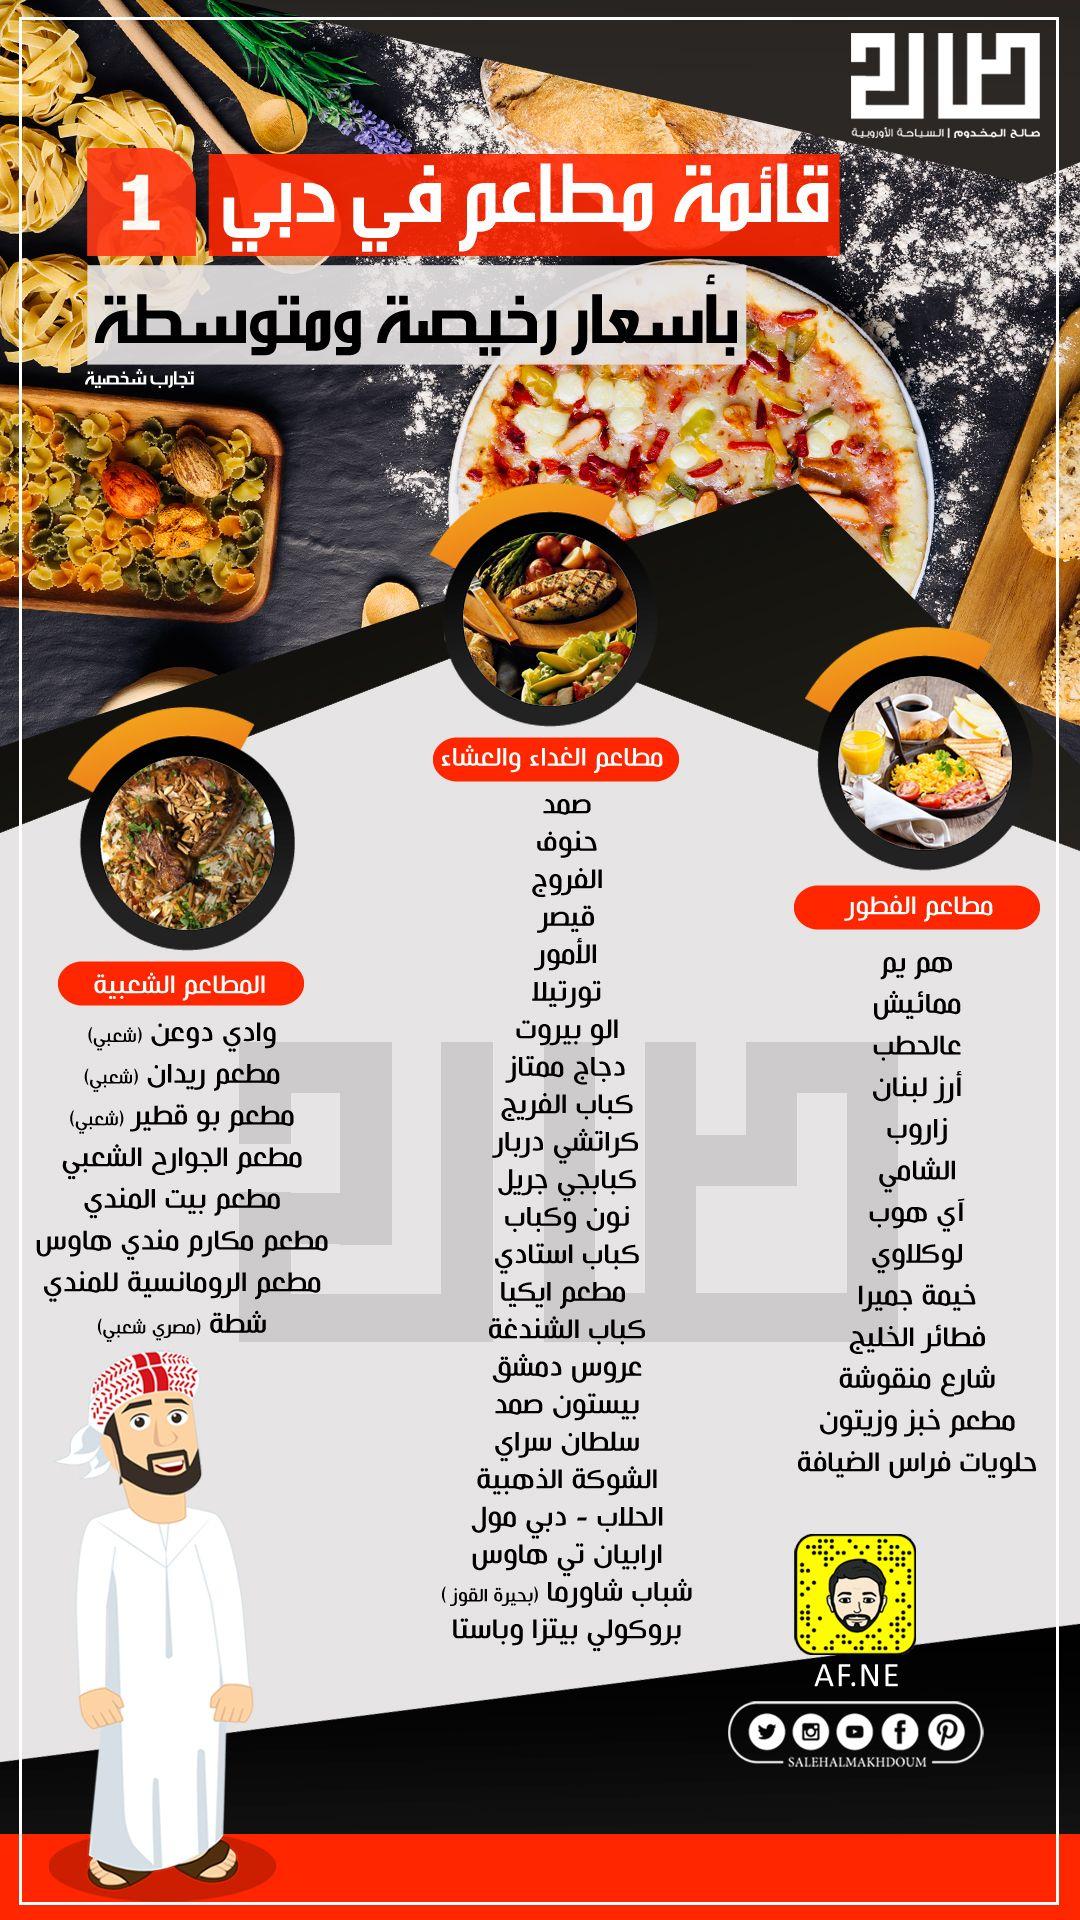 مطاعم رخيصة في دبي Travel Movie Posters